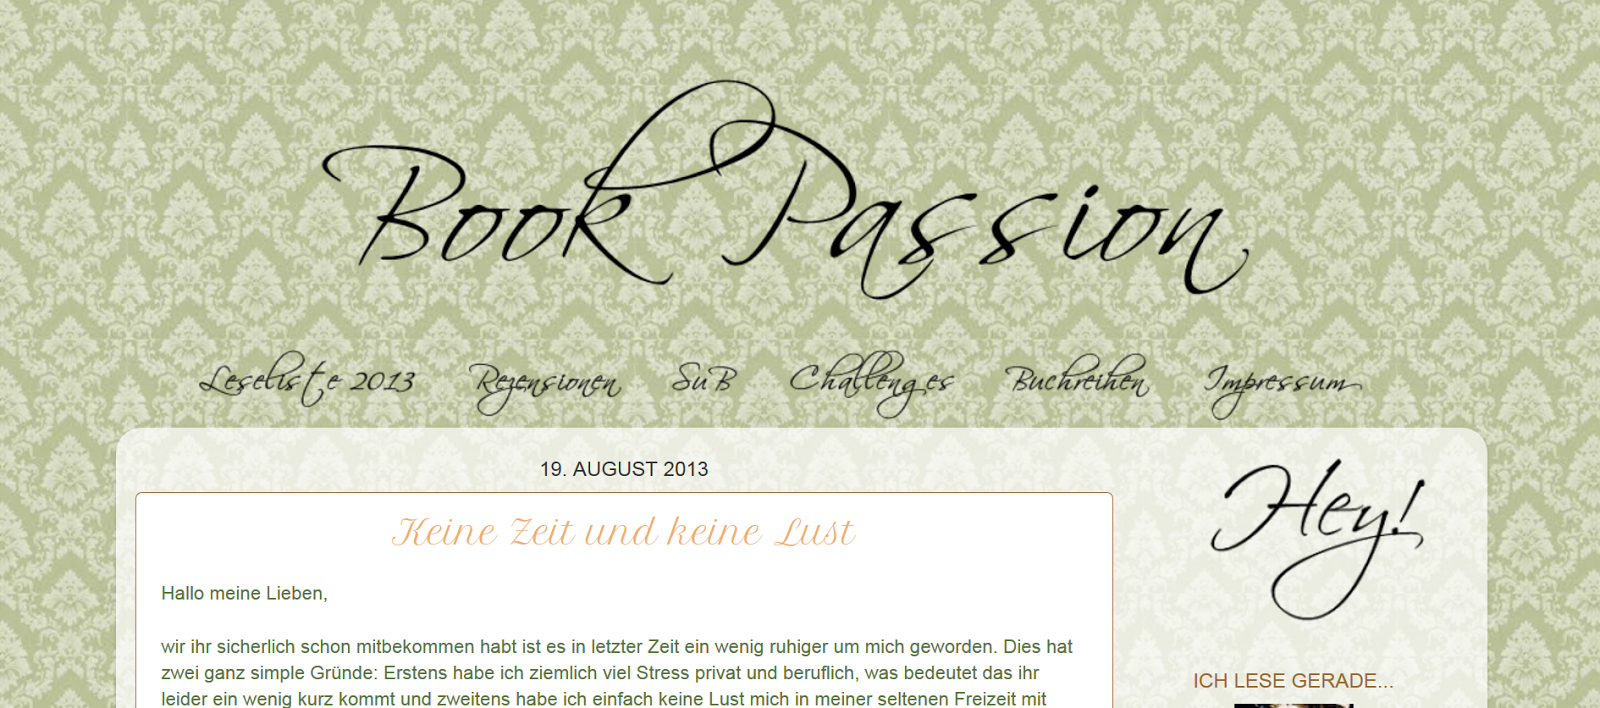 http://janaskleinebuecherwelt.blogspot.de/